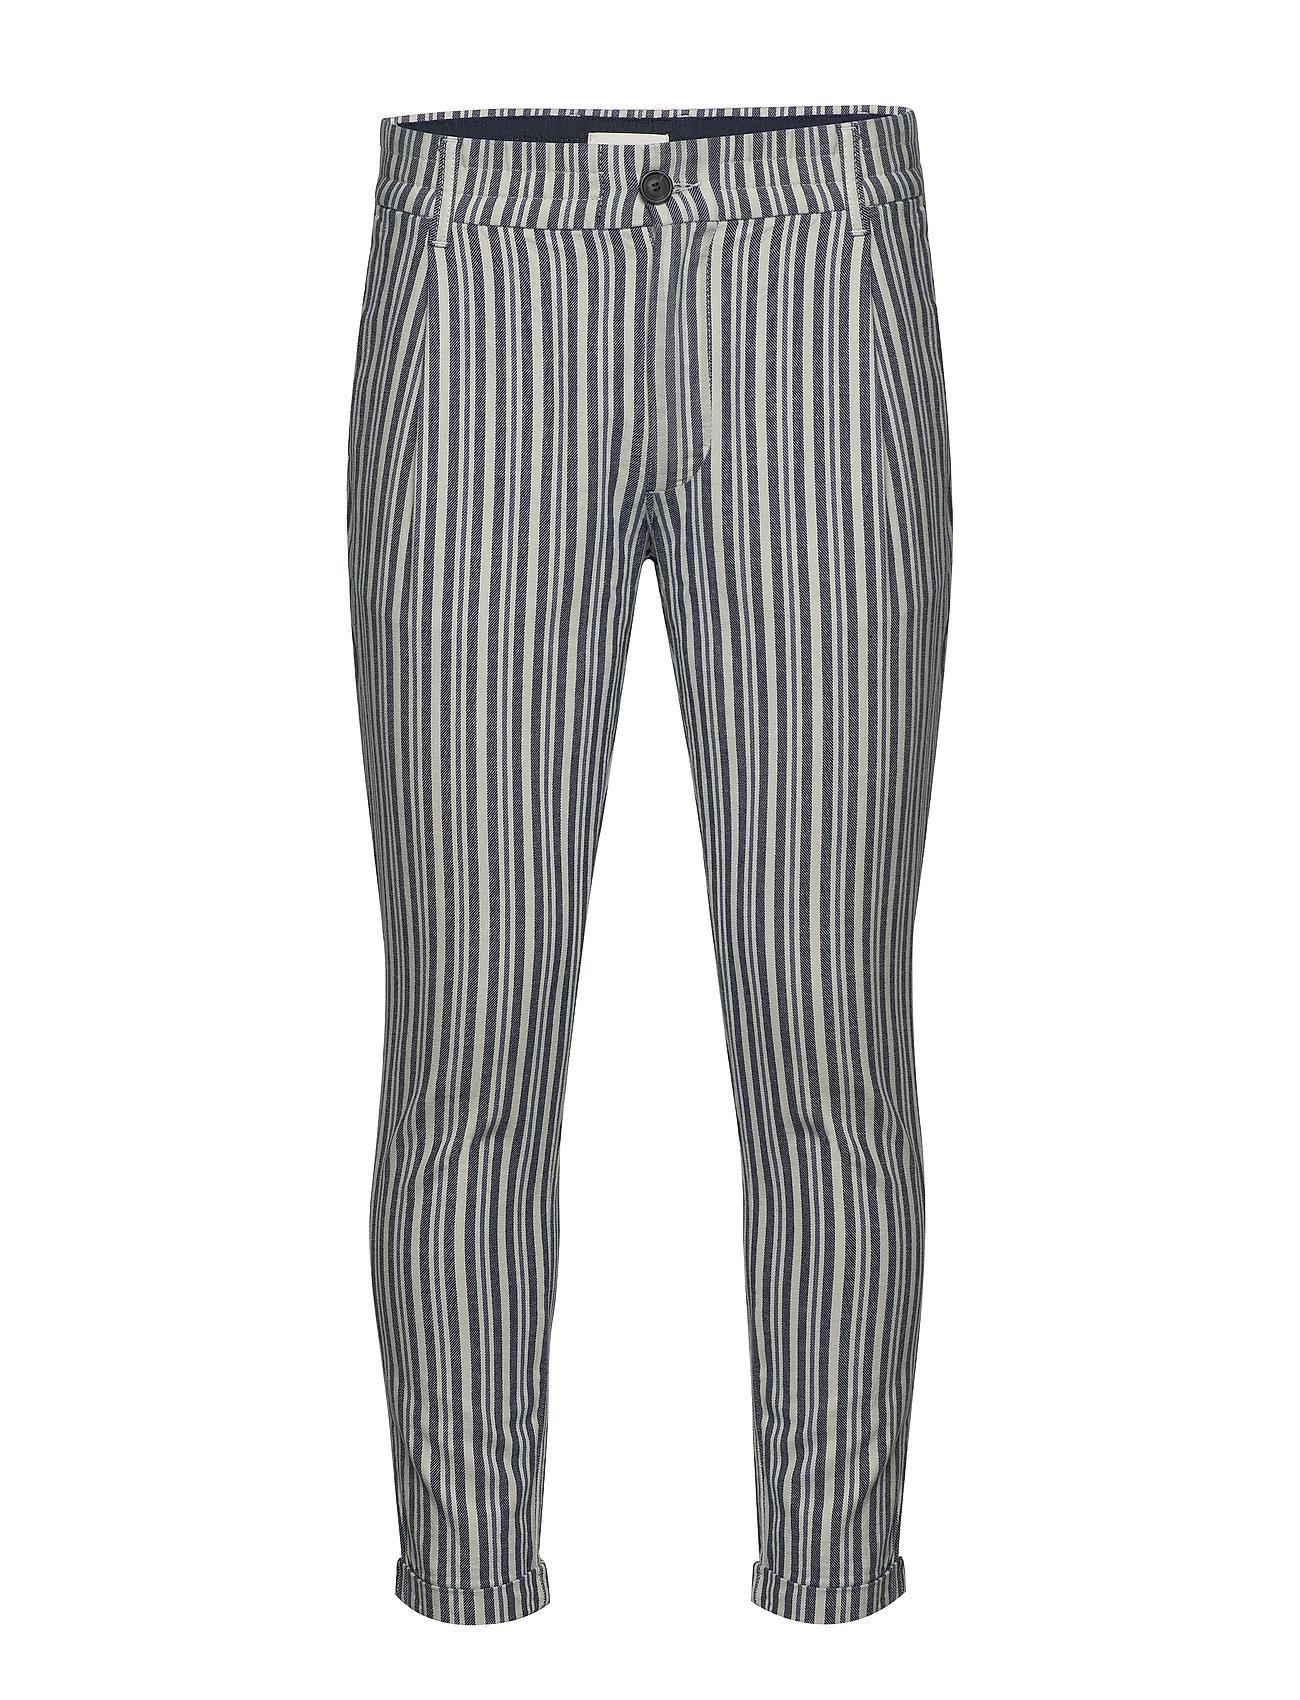 Image of Bryce Dy Stripe Pants Casual Bukser Blå Gabba (3505008687)